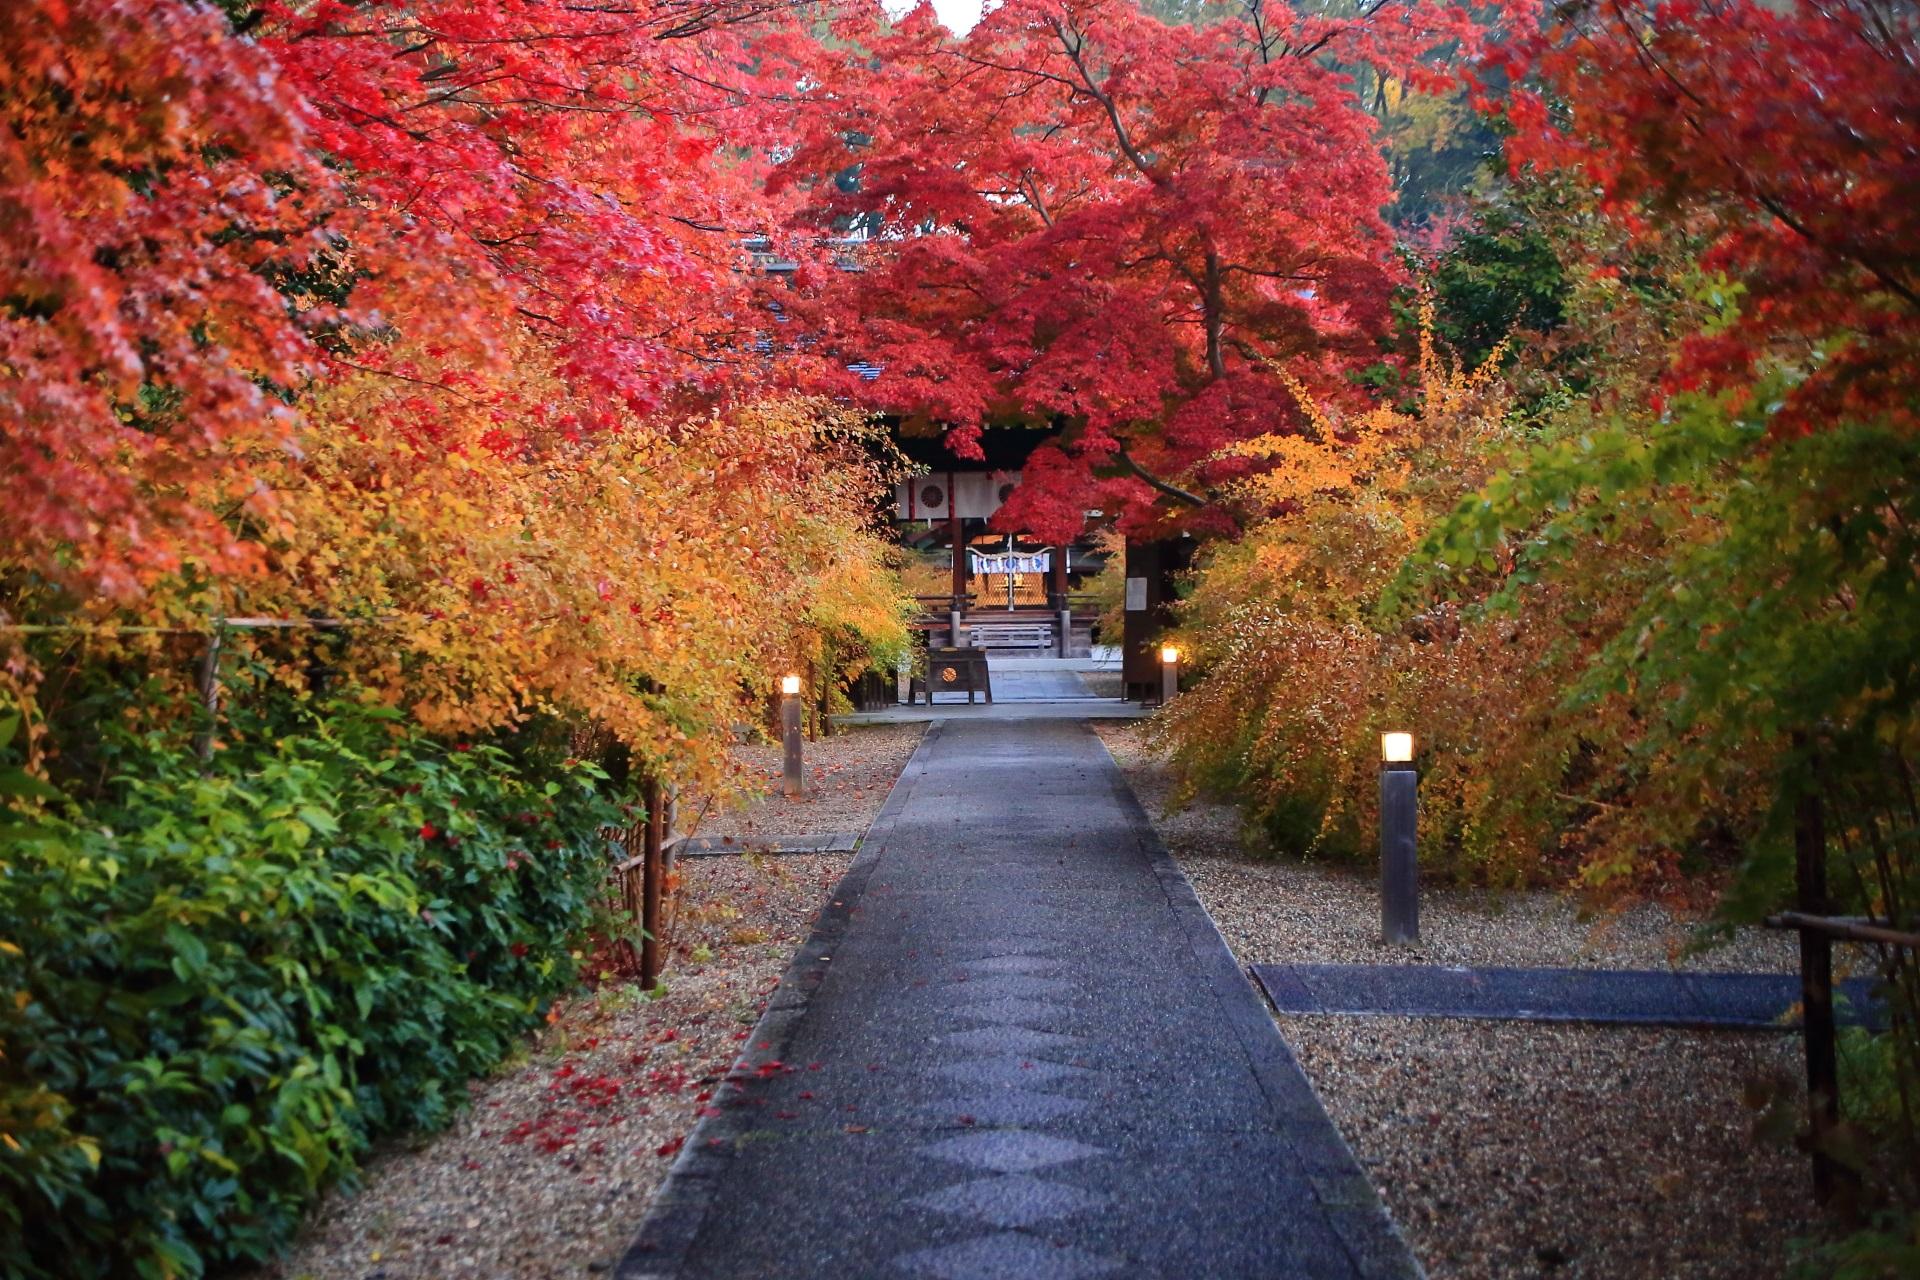 梨木神社 参道の紅葉